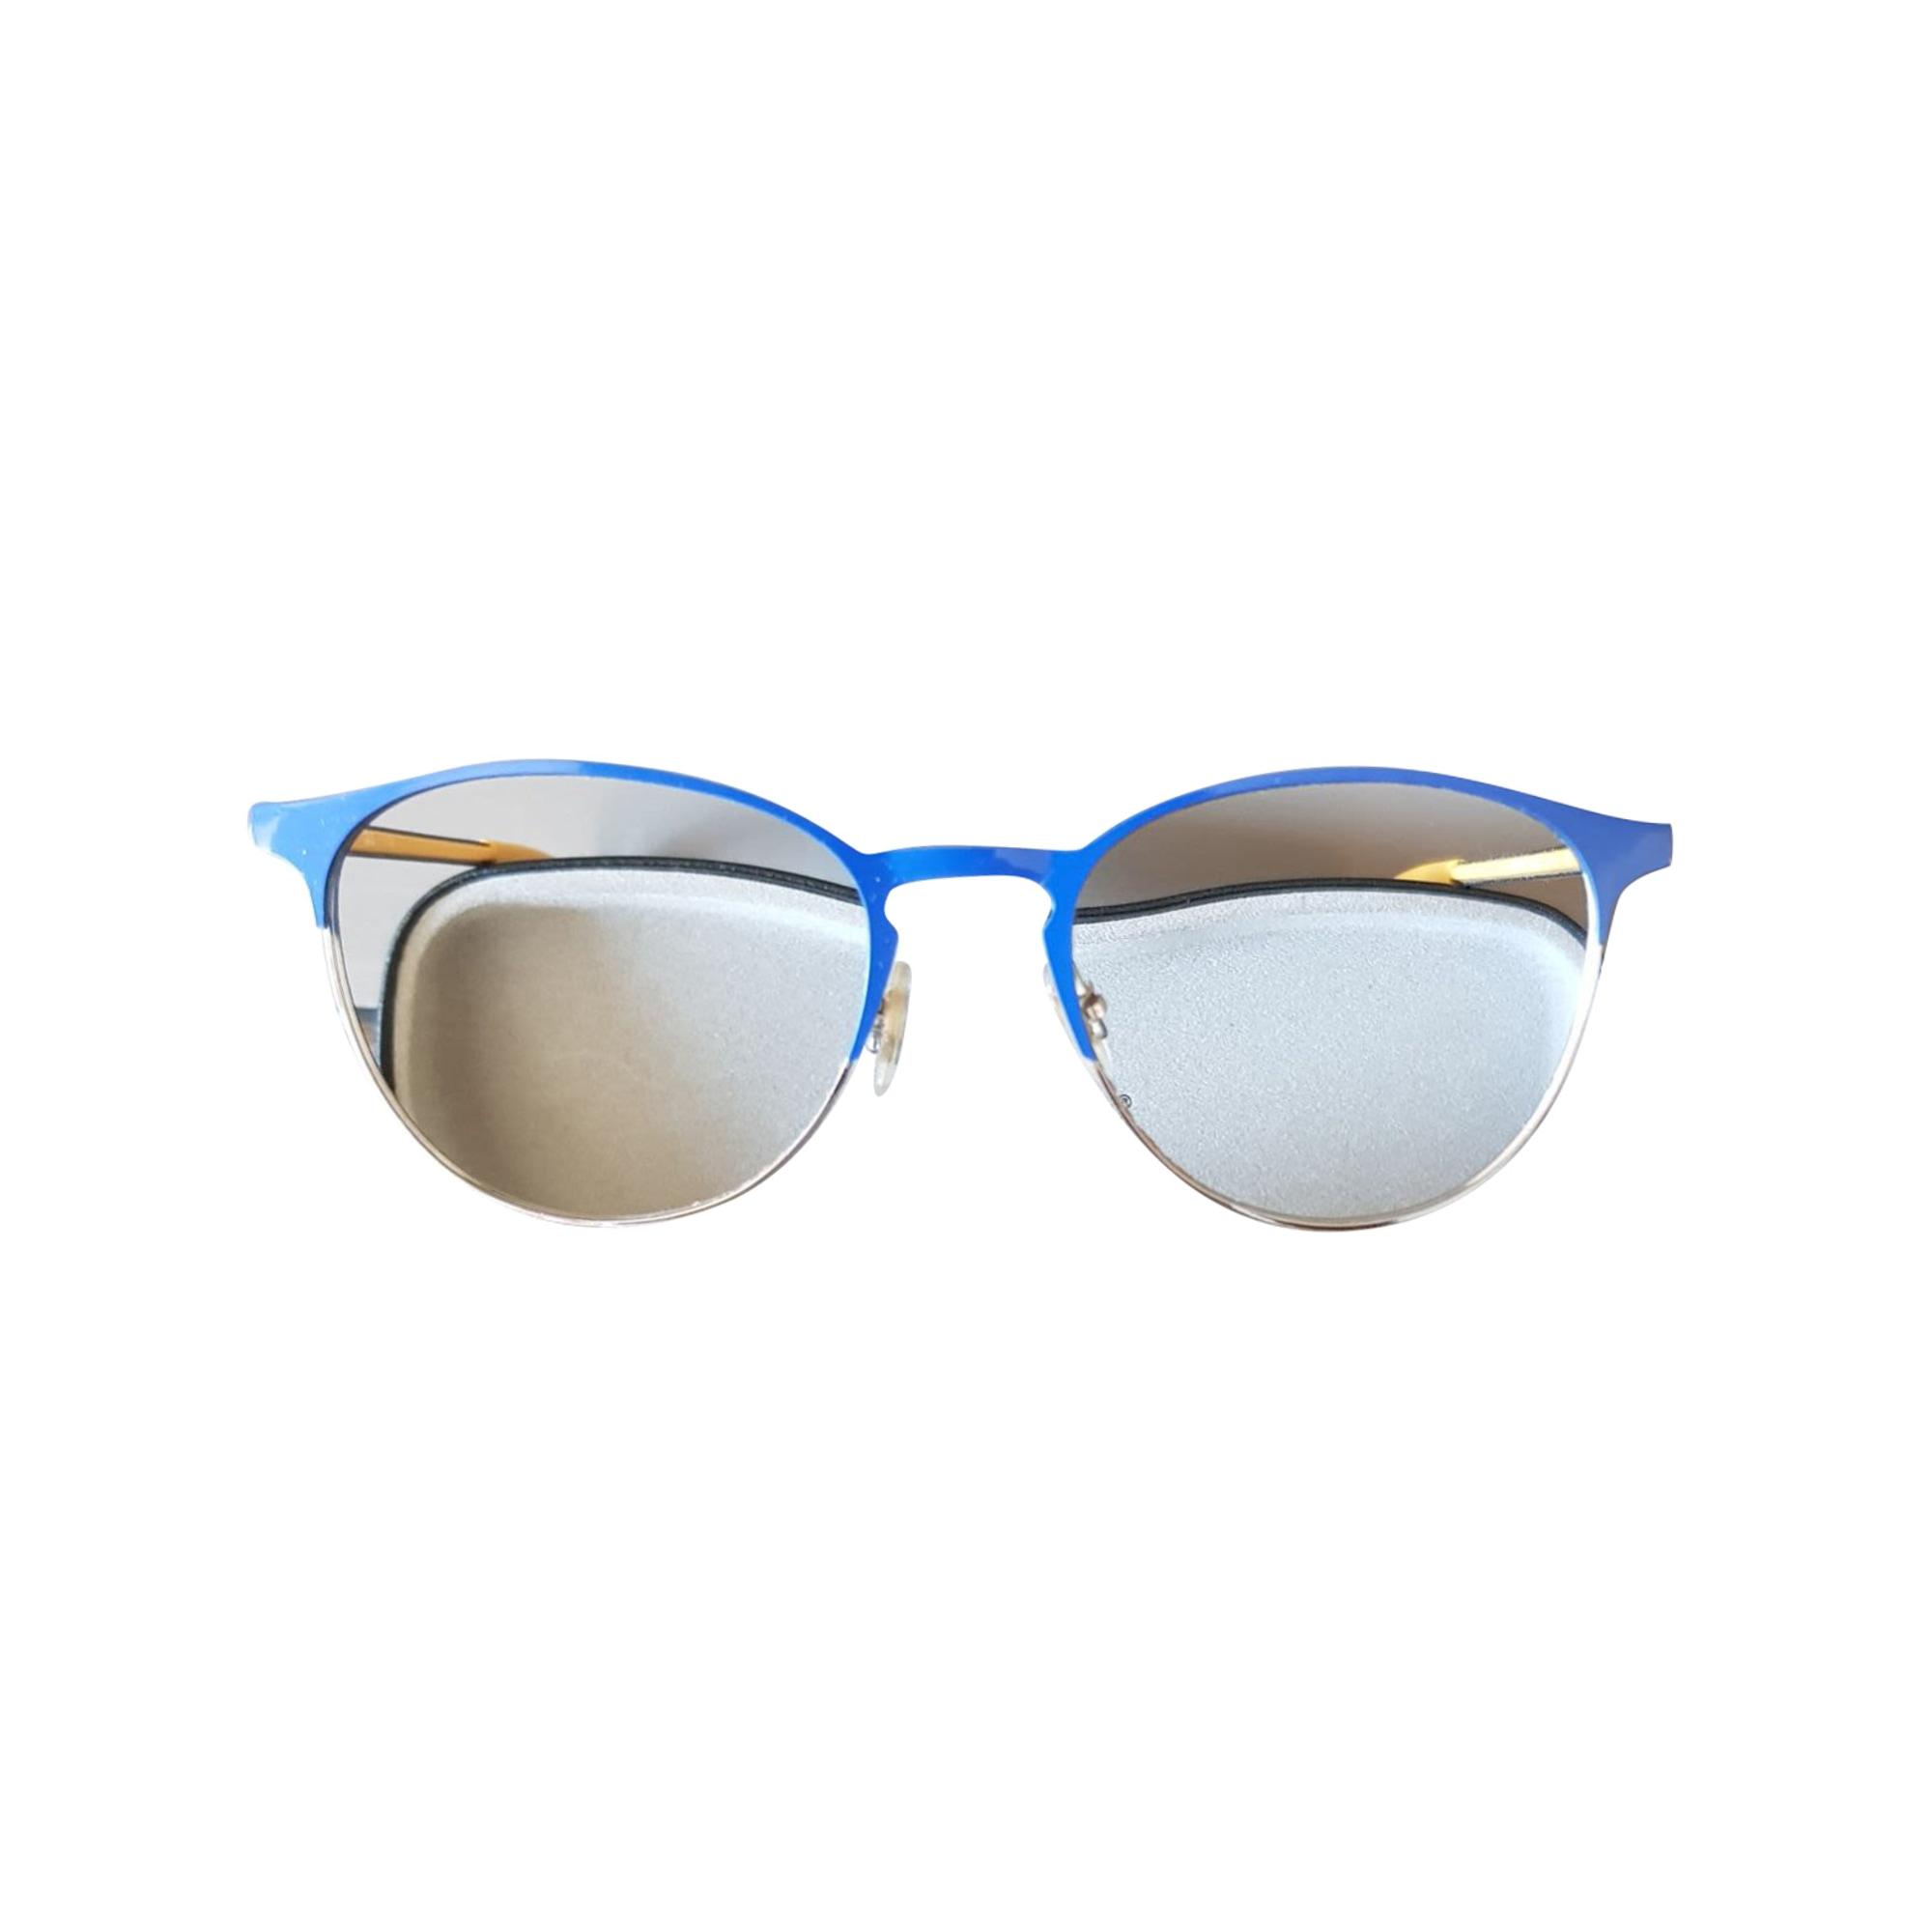 Eyeglass Frames RAY-BAN Blue, navy, turquoise